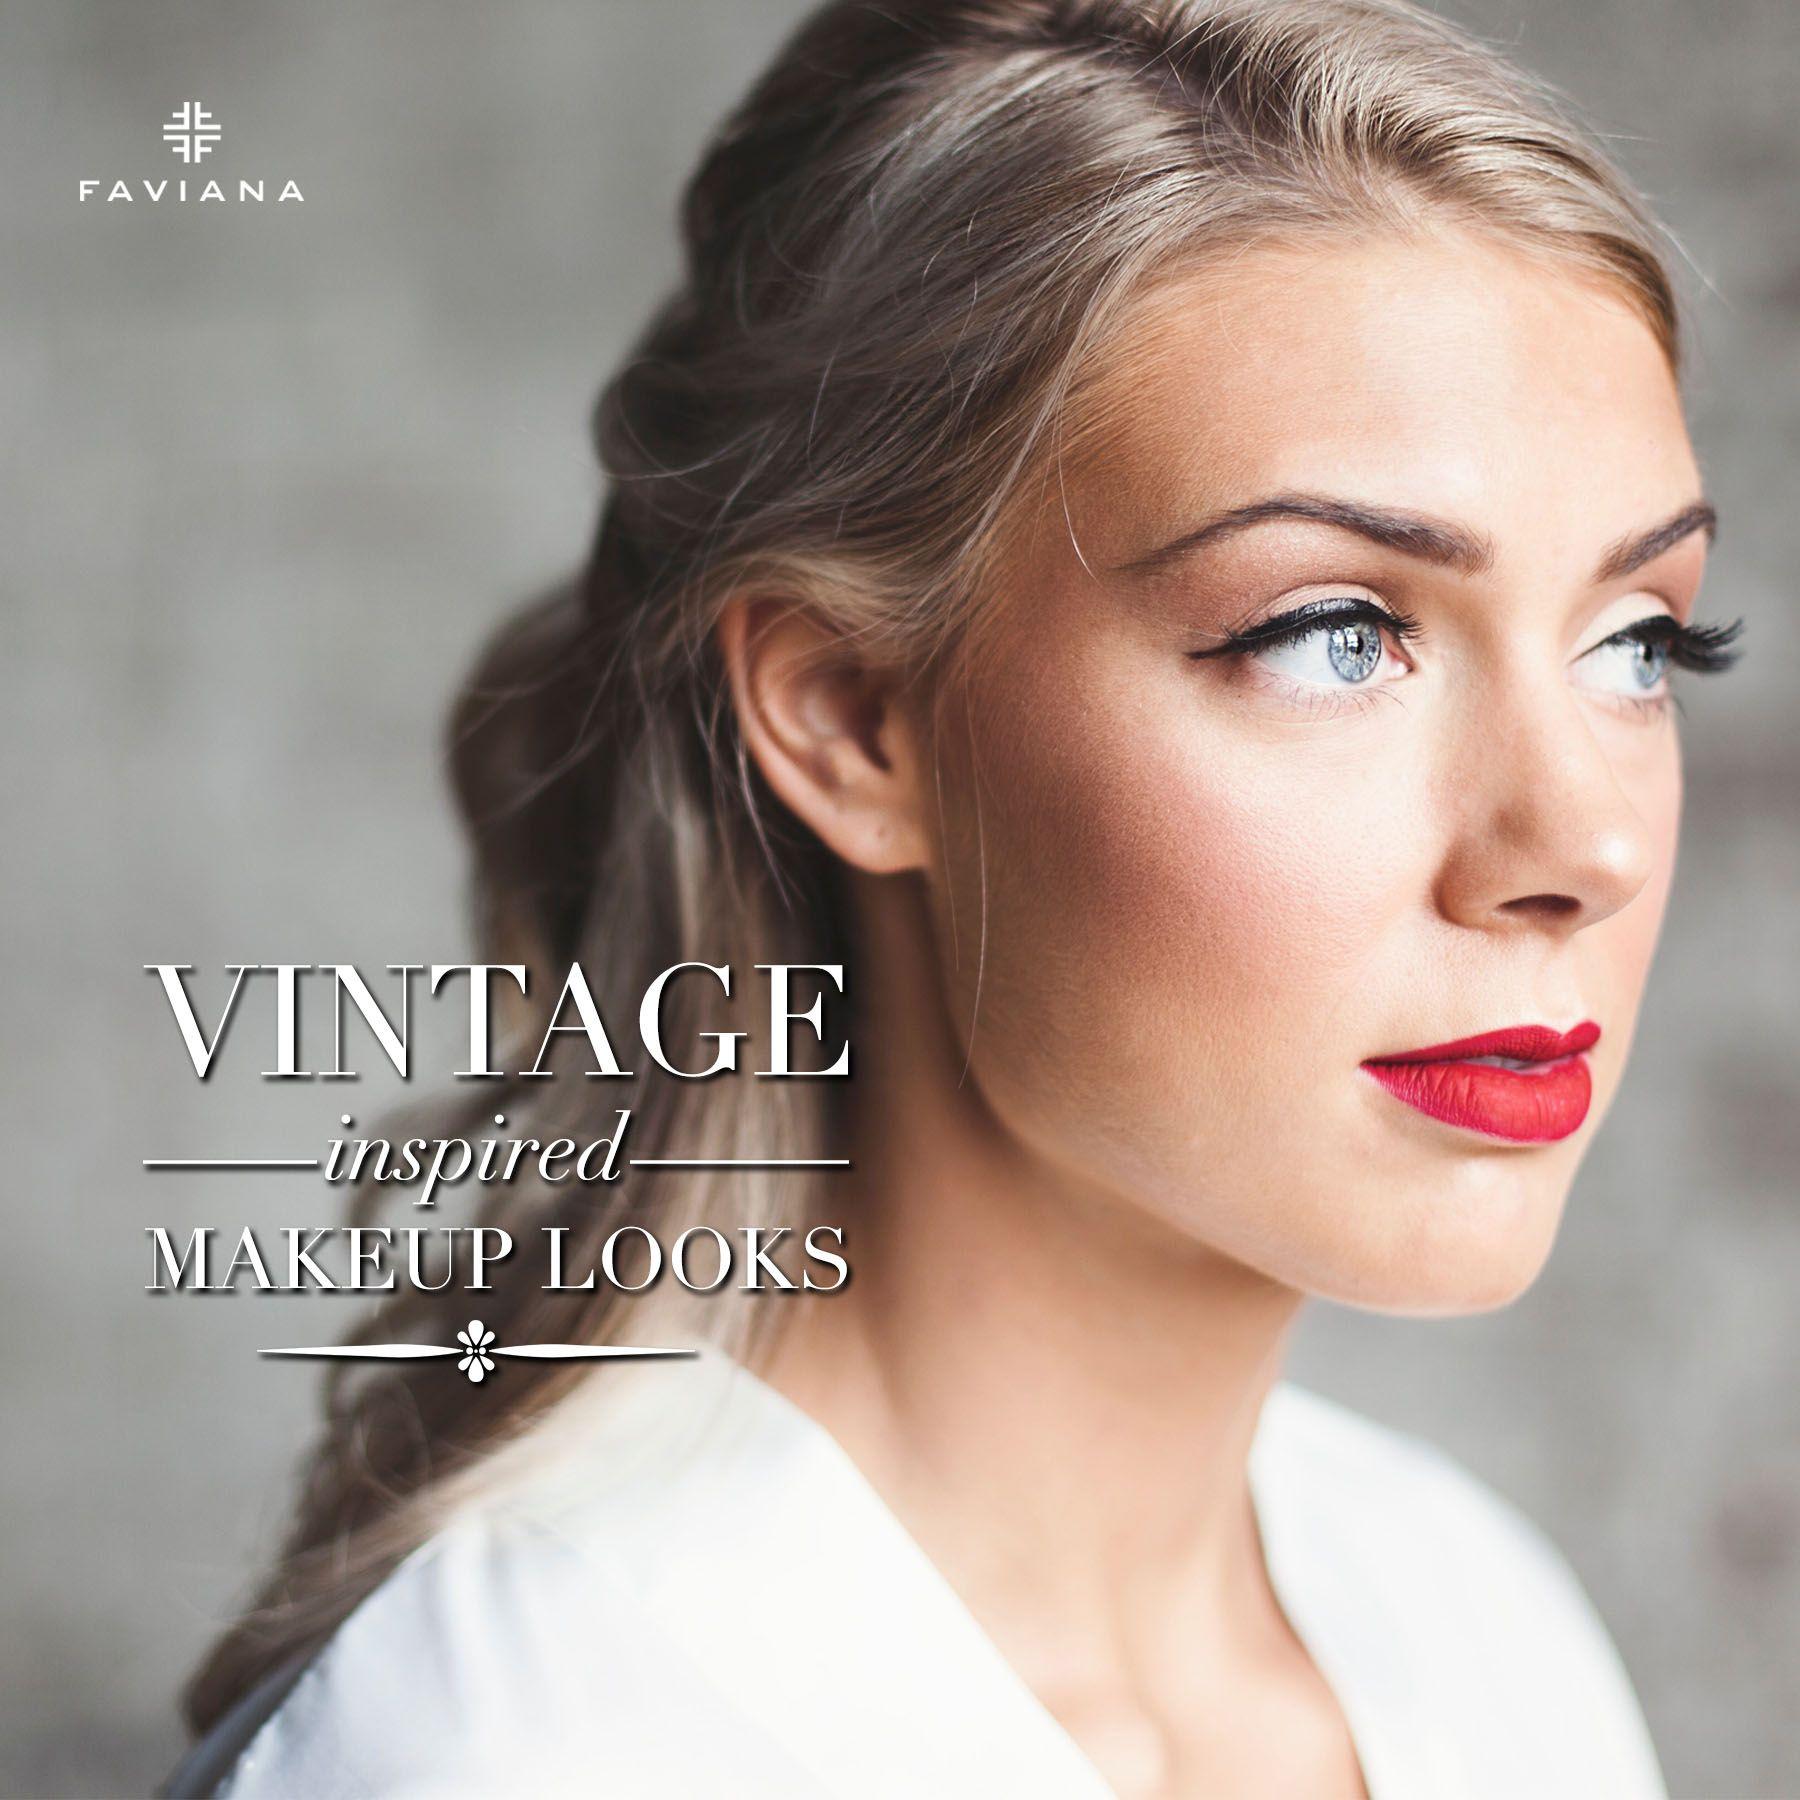 Vintage Inspired Makeup Looks Makeup Inspiration Makeup Looks Vintage Inspired